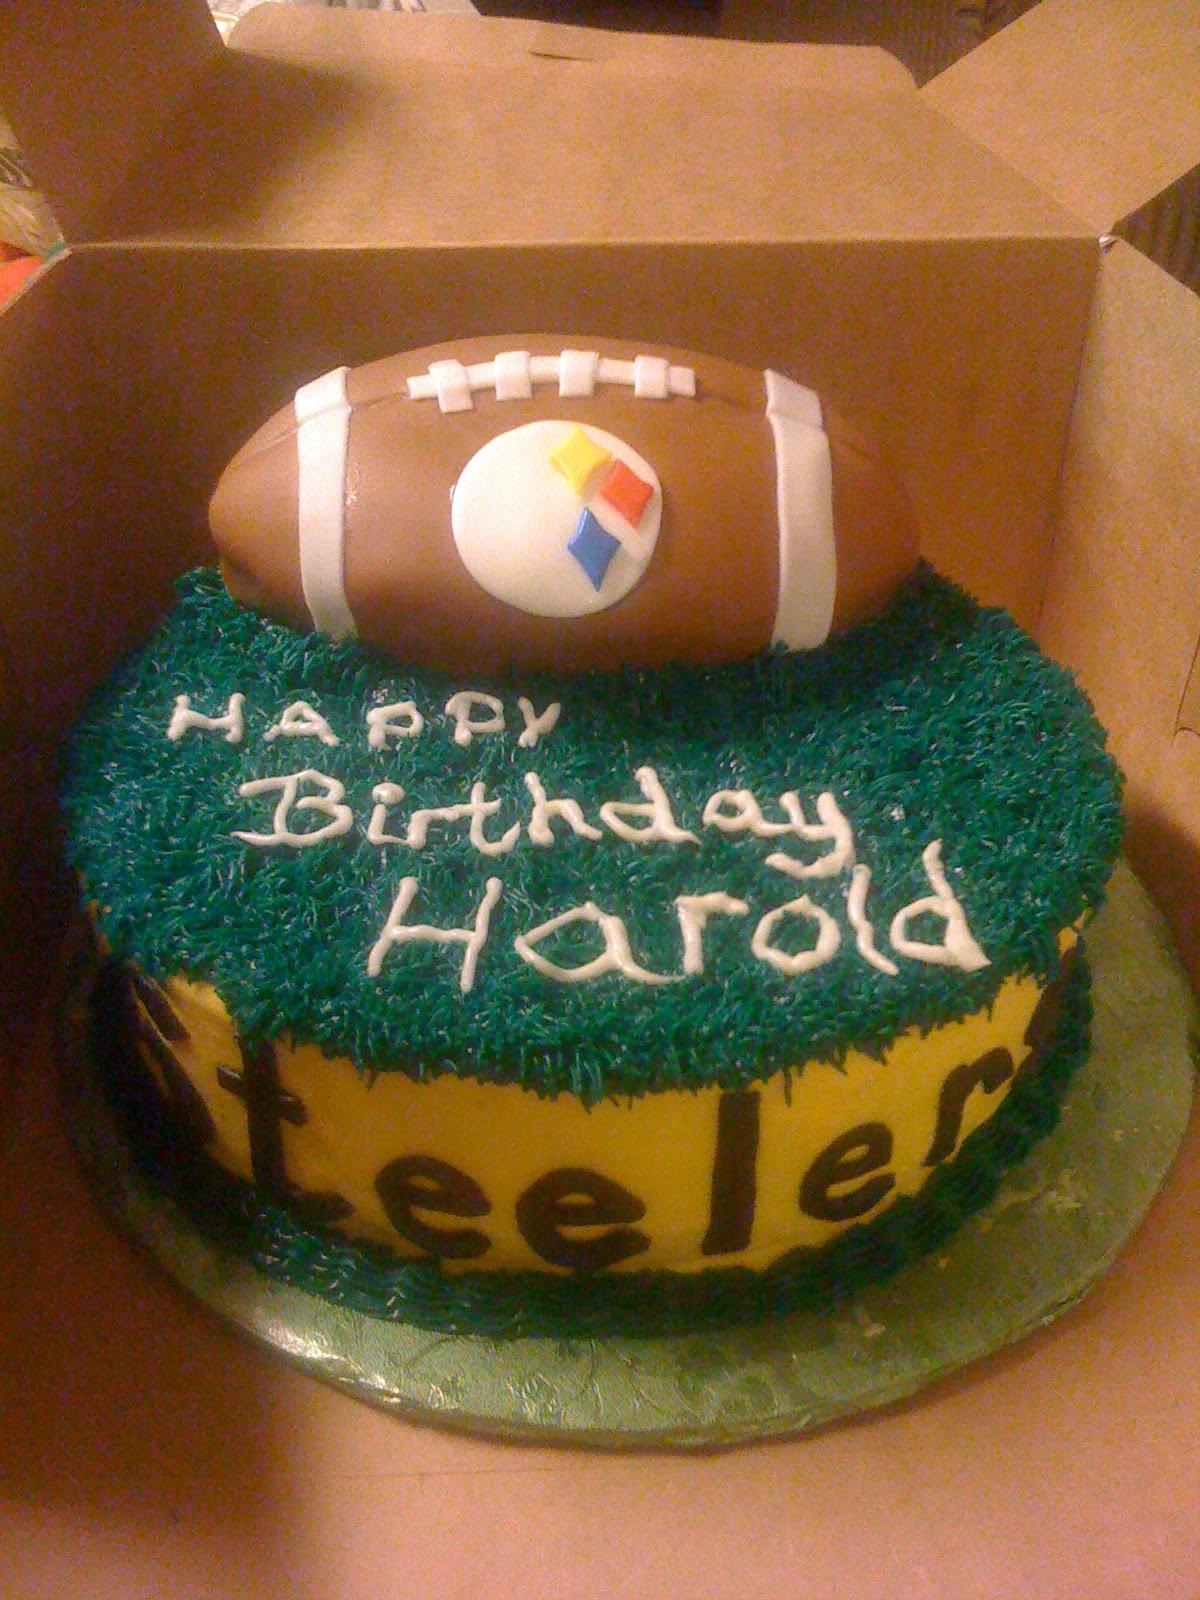 how to make a steelers cake